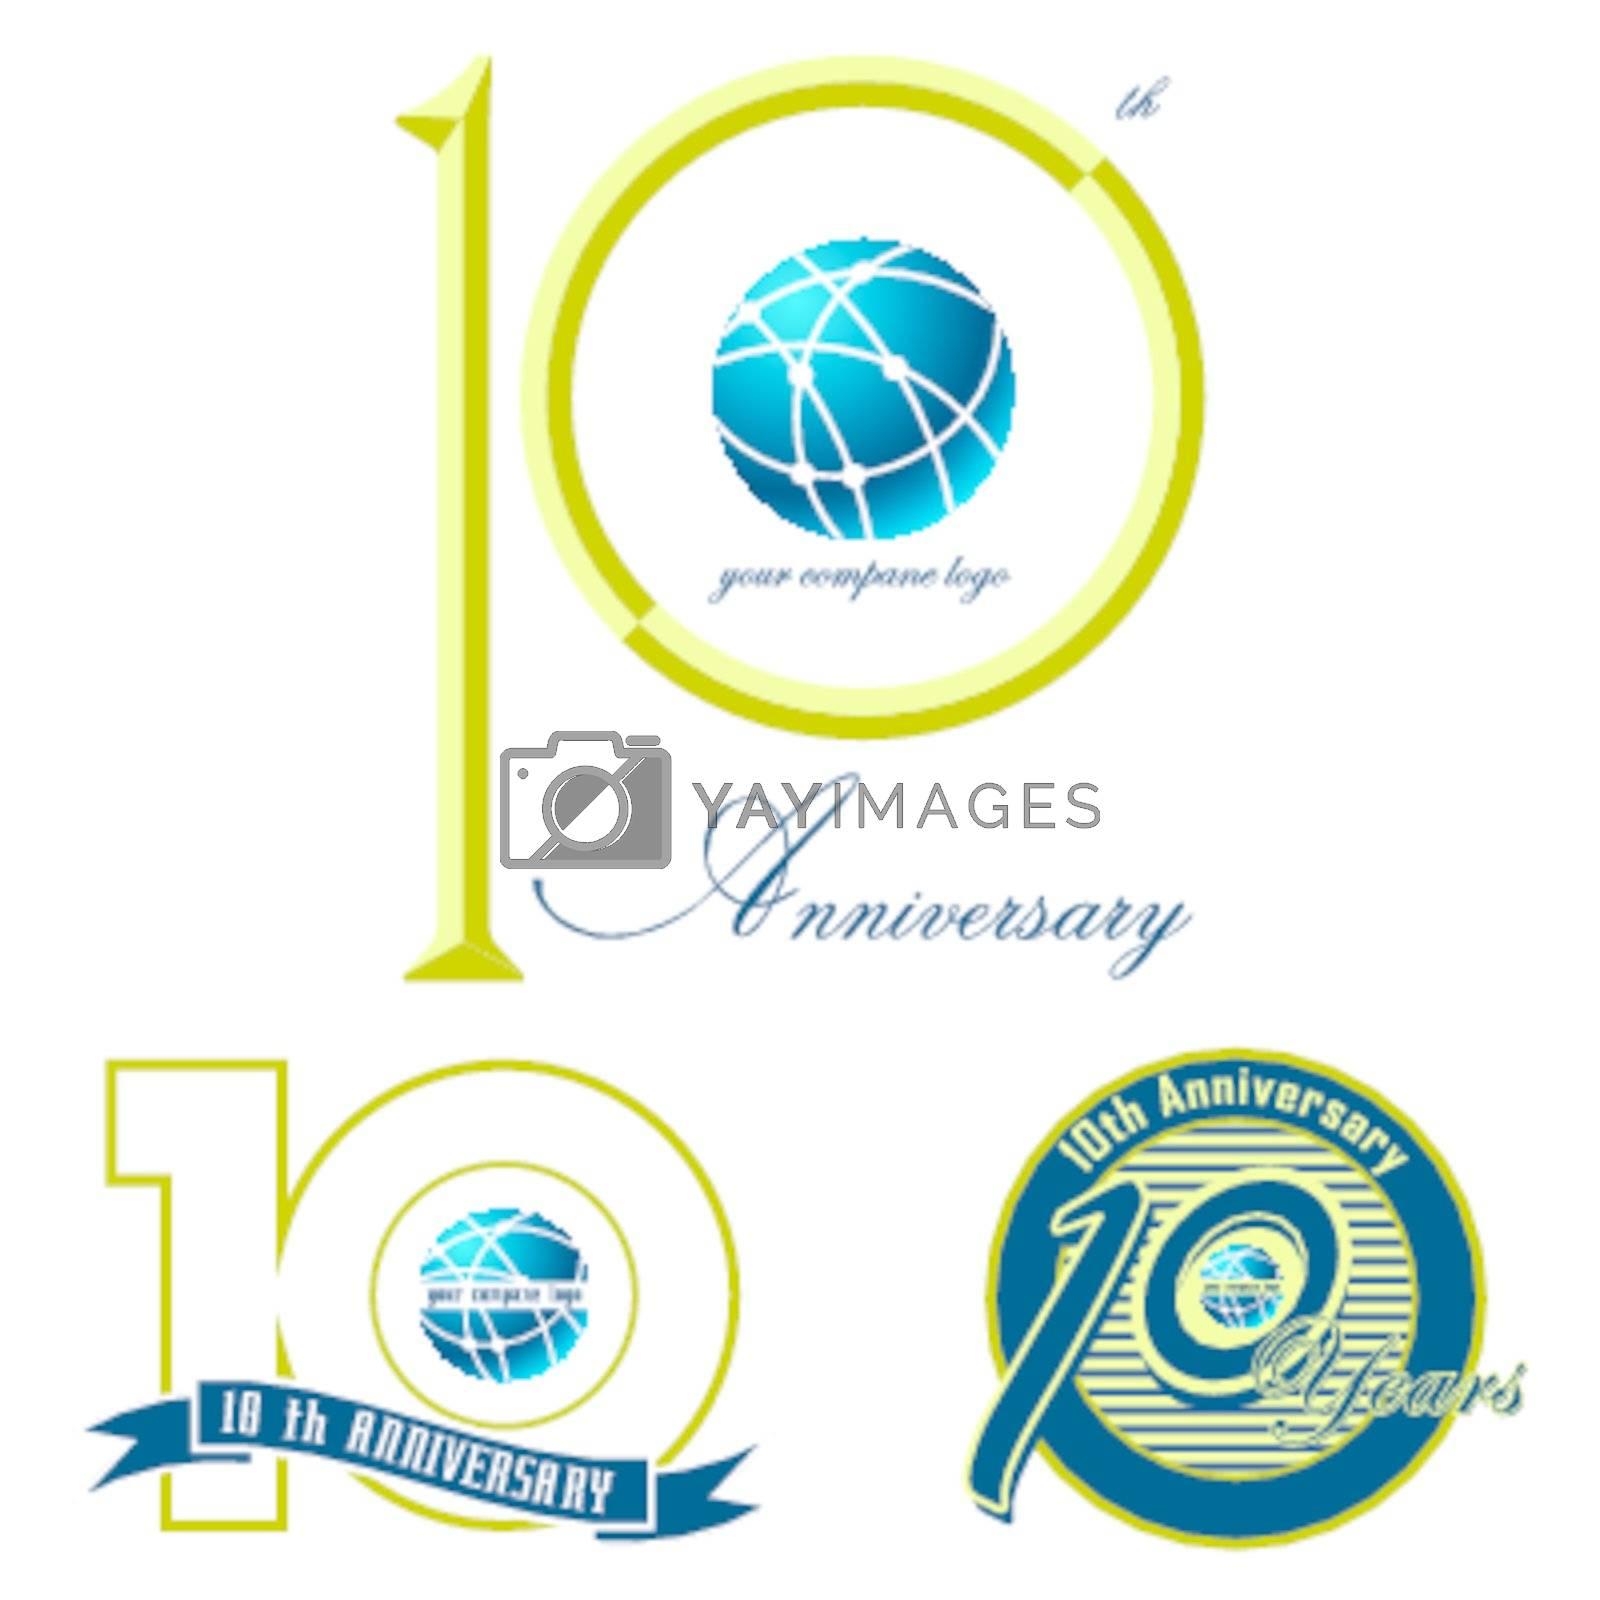 set of 10th anniversary mark illustration design on white